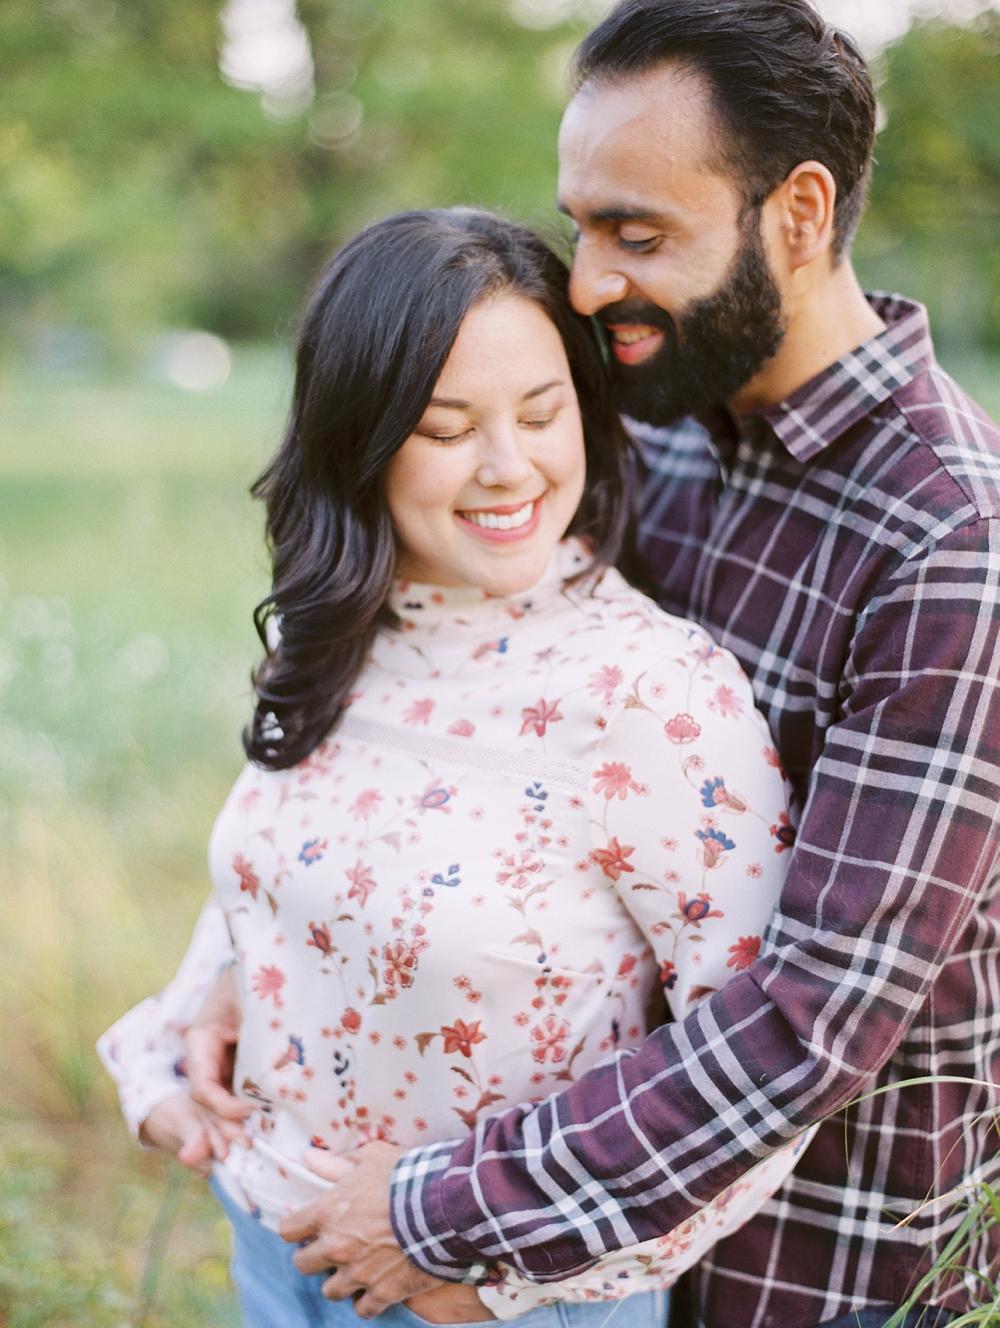 kristin-la-voie-photography-lake-katherine-chicago-wedding-photographer-4